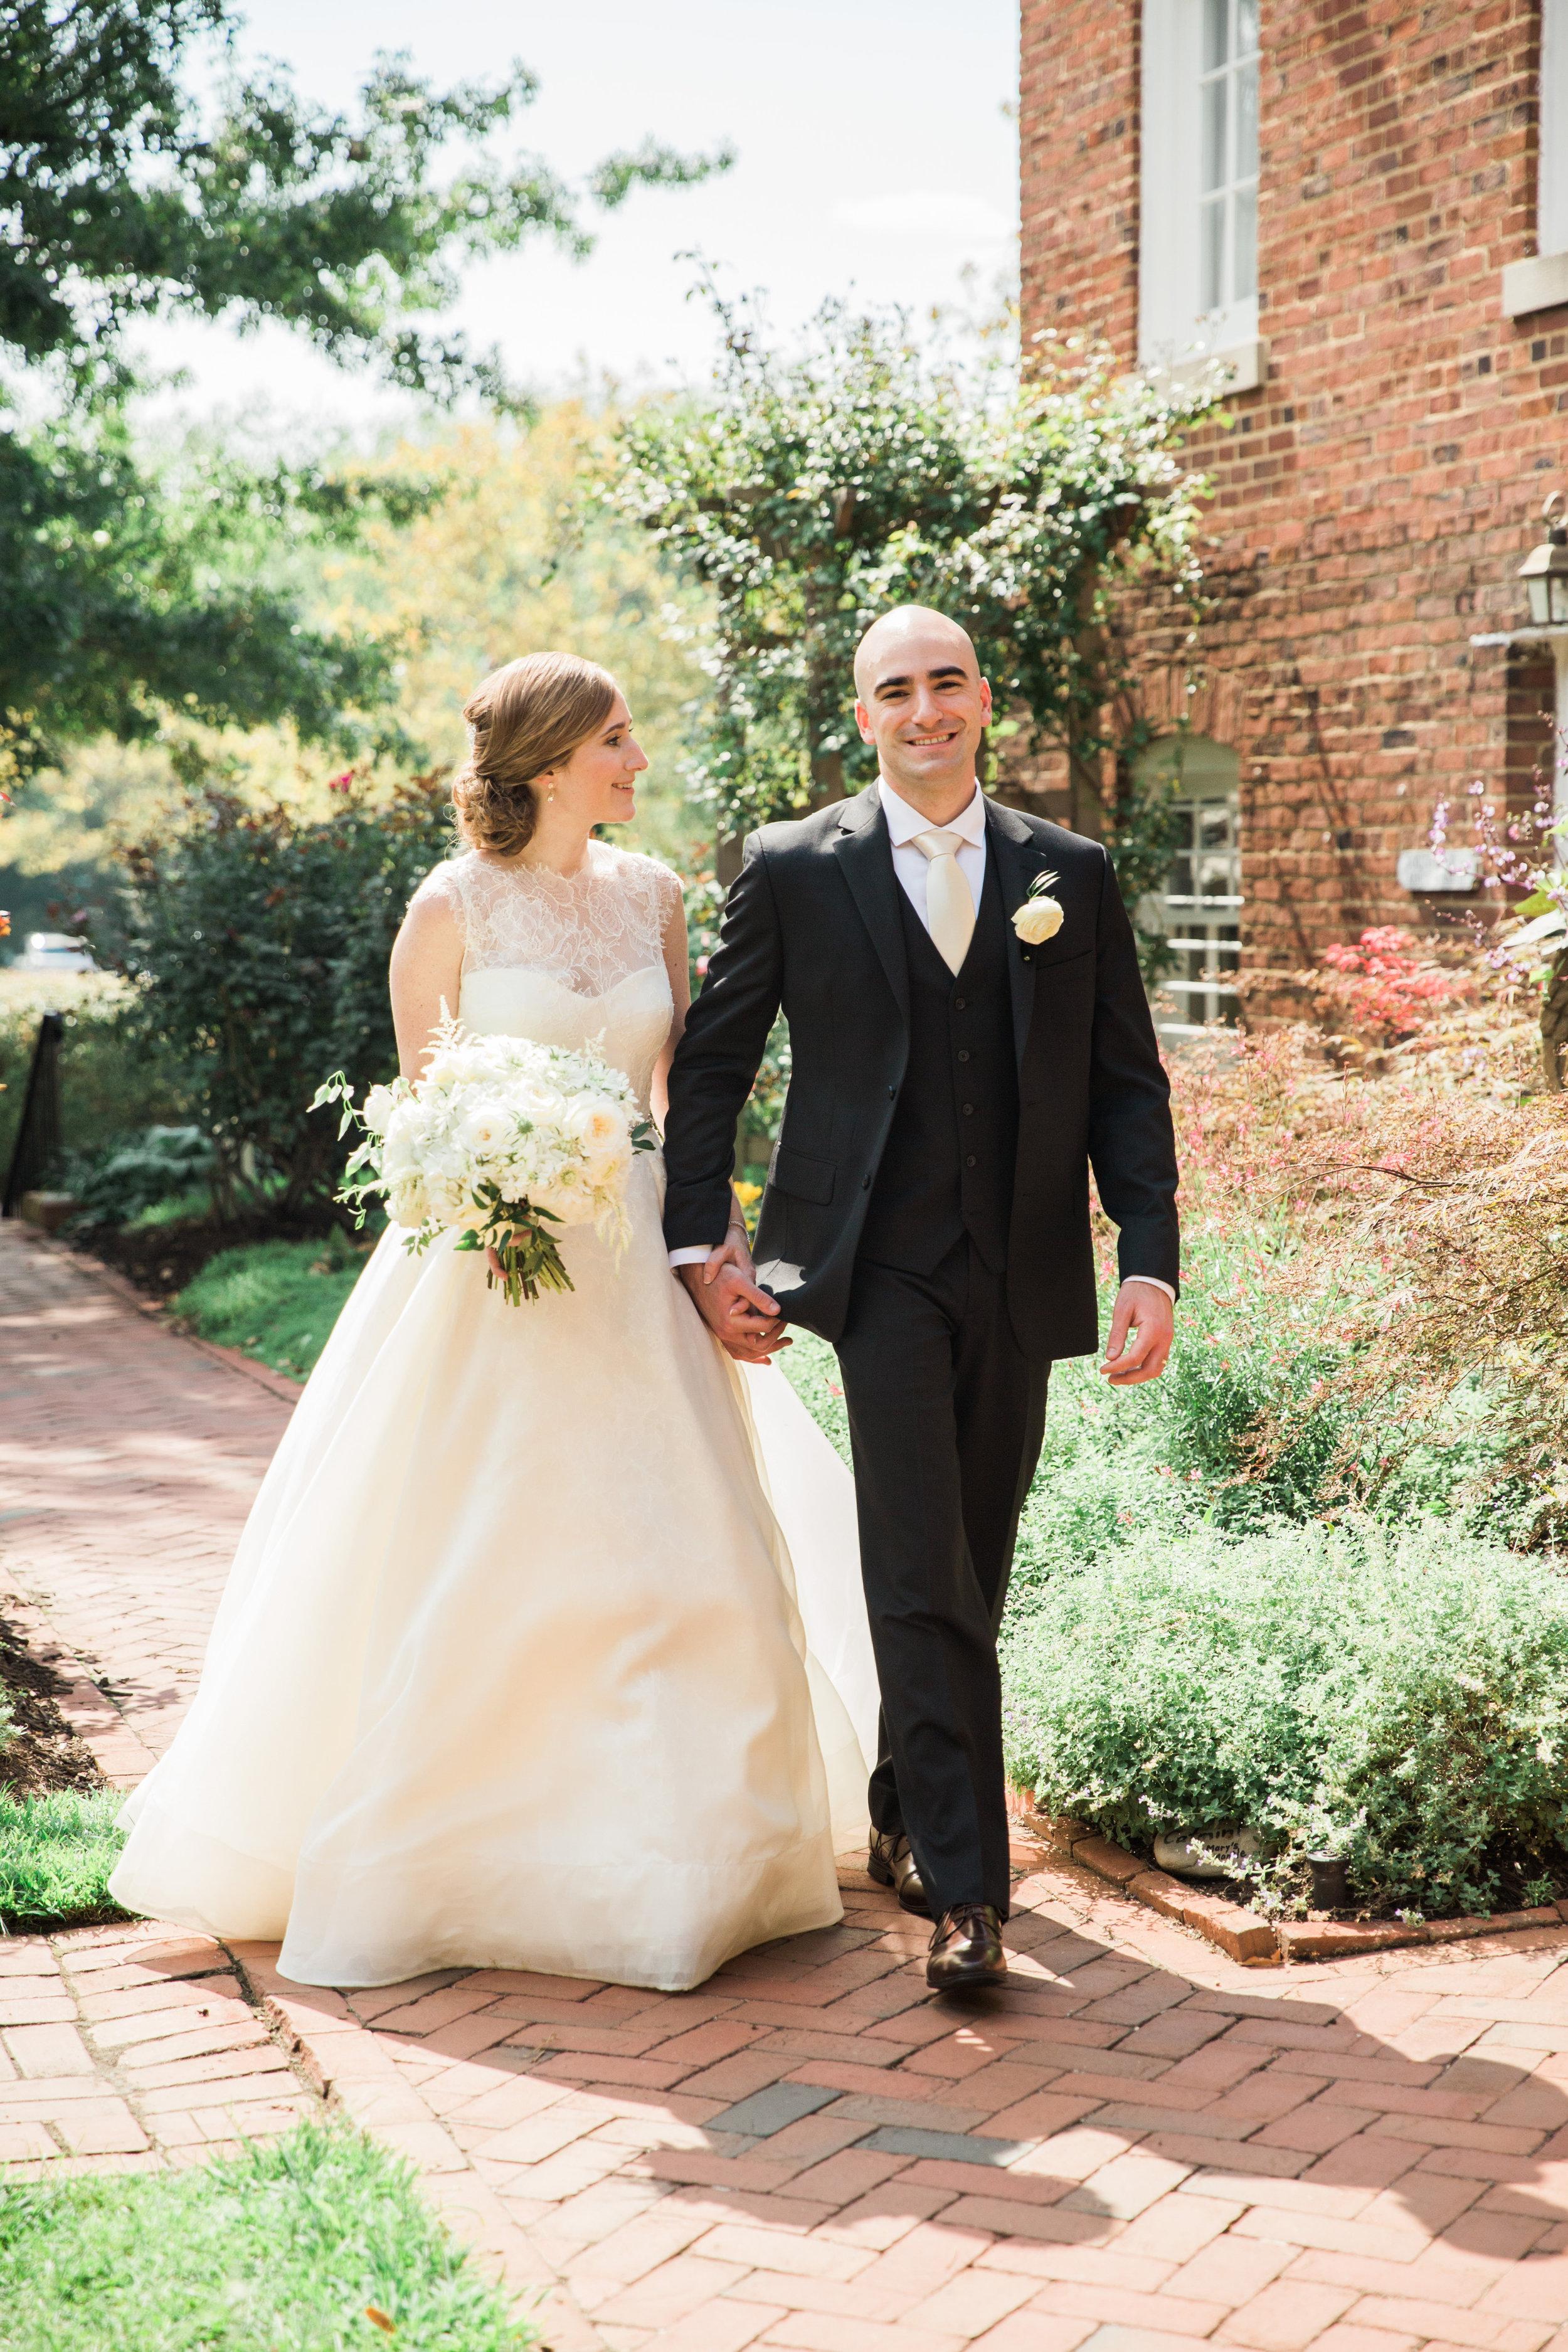 046-MA17_St-Marys-Catholic-Church-Annapolis-Wedding.jpg